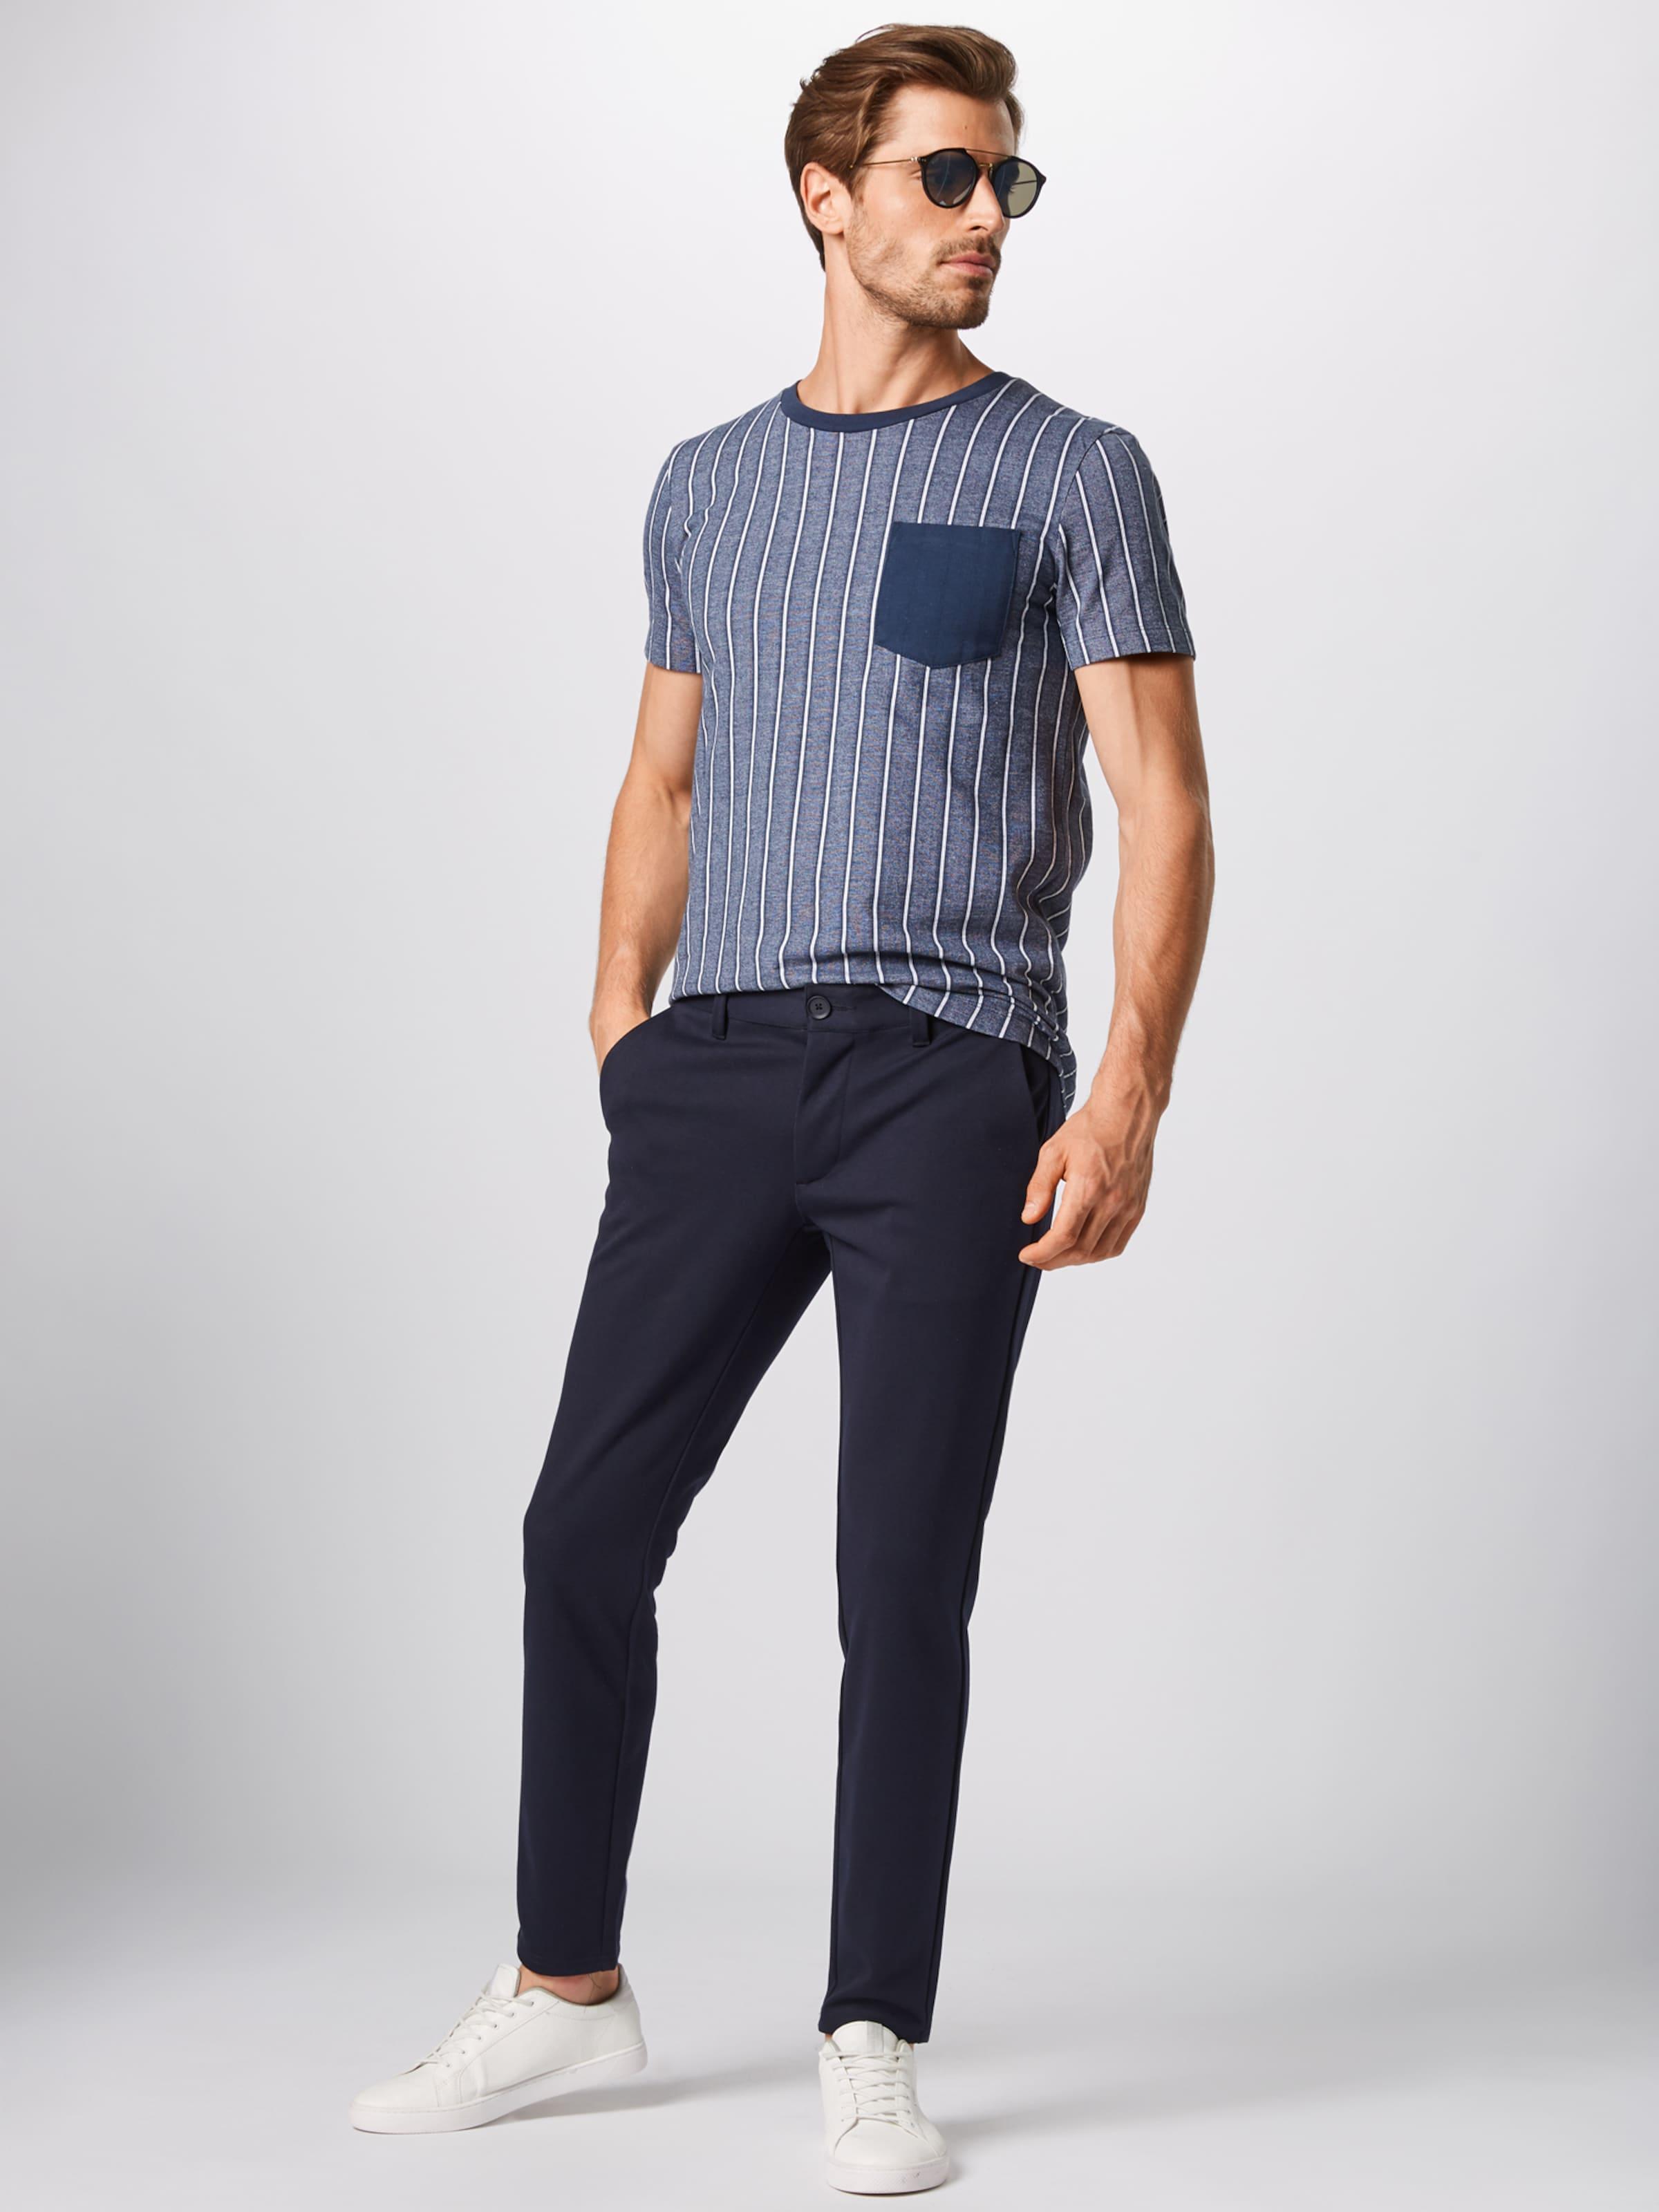 'striped Denim In shirt Tom Tailor T DunkelblauWeiß Piqu' He2YD9IWE